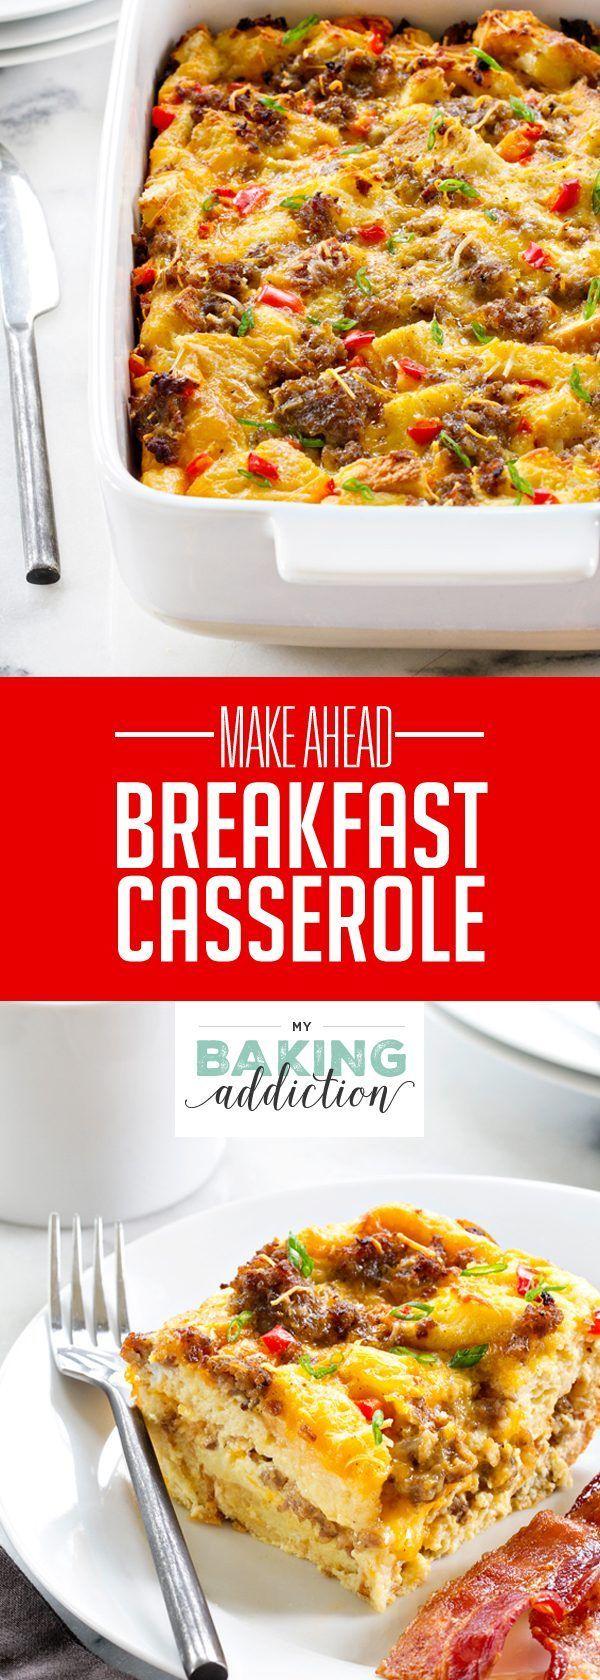 Make Ahead Breakfast Casserole - My Baking Addiction